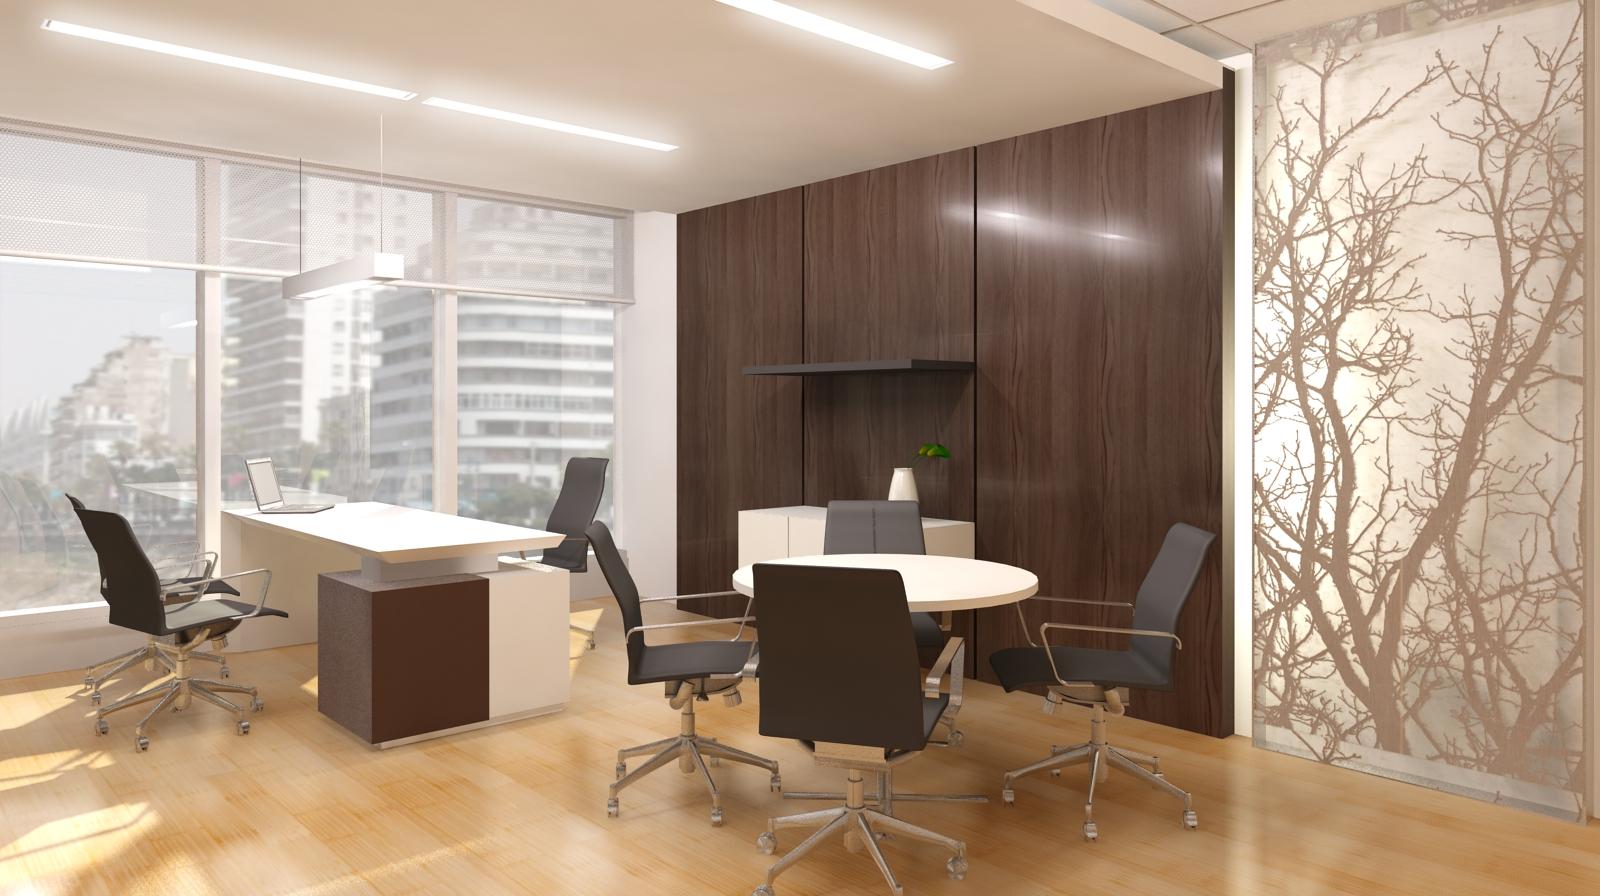 Director room design joy studio design gallery best design for Architect studio 3d online room design